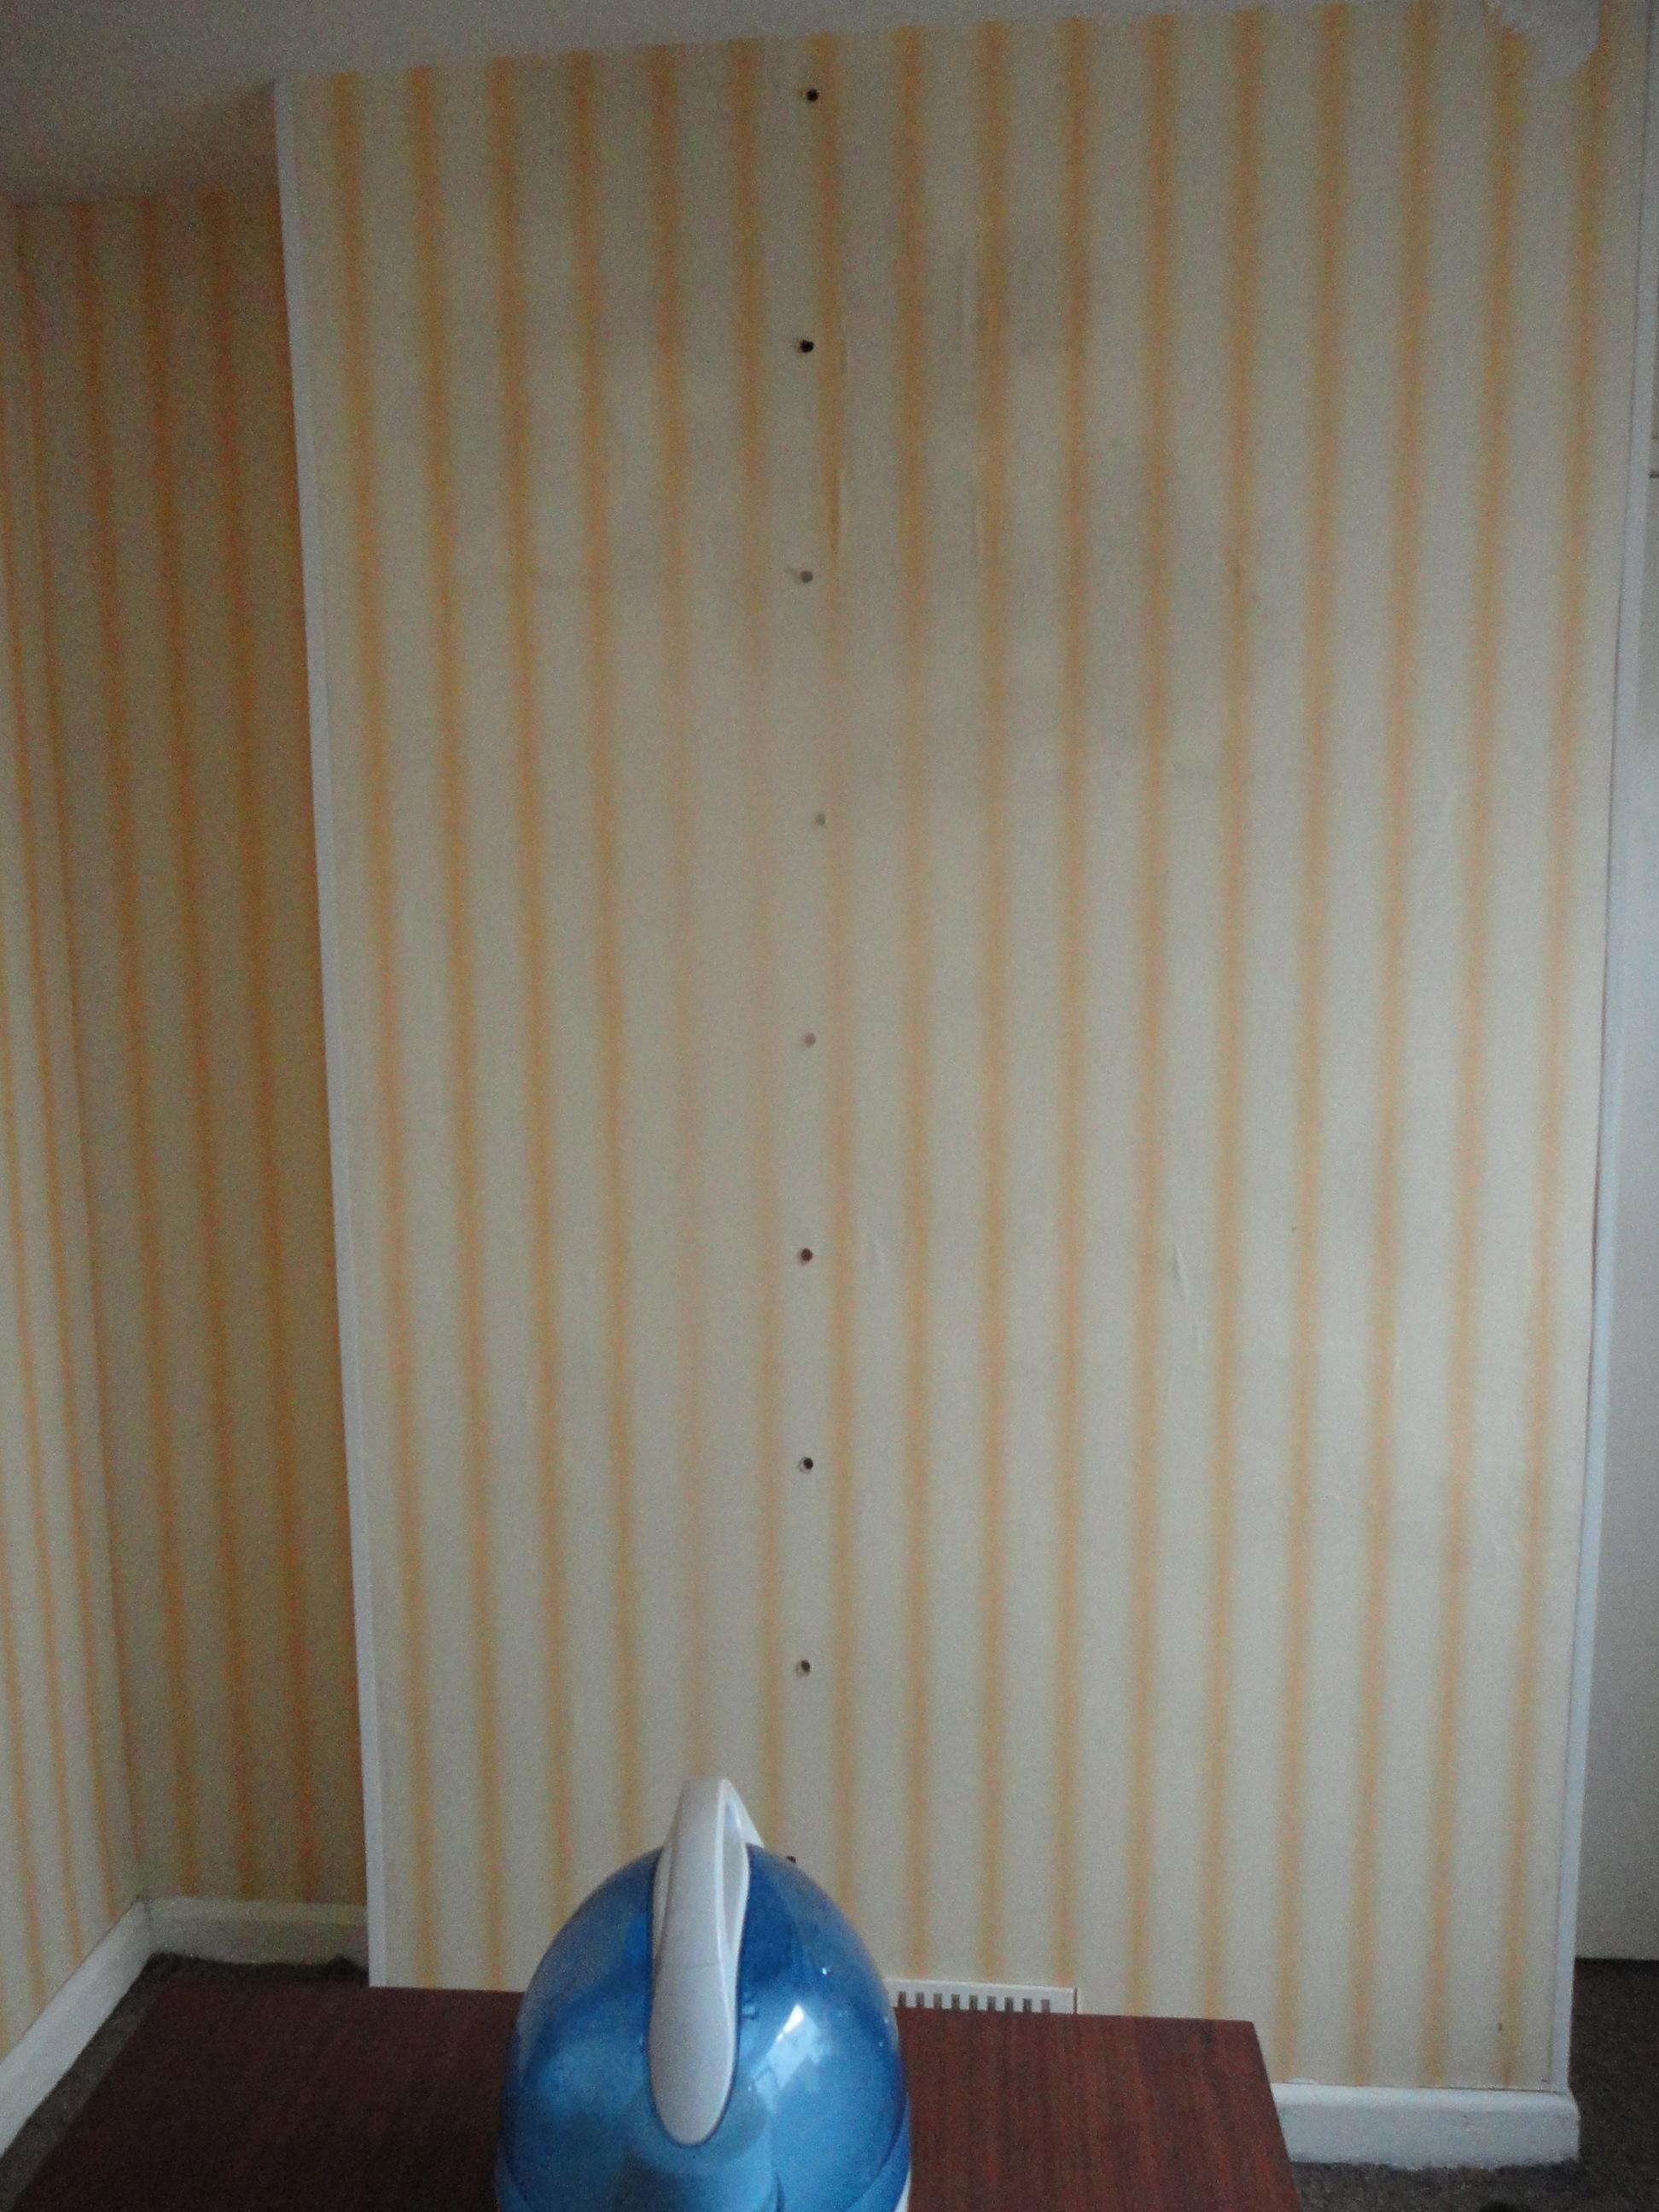 Damp on bedroom walls